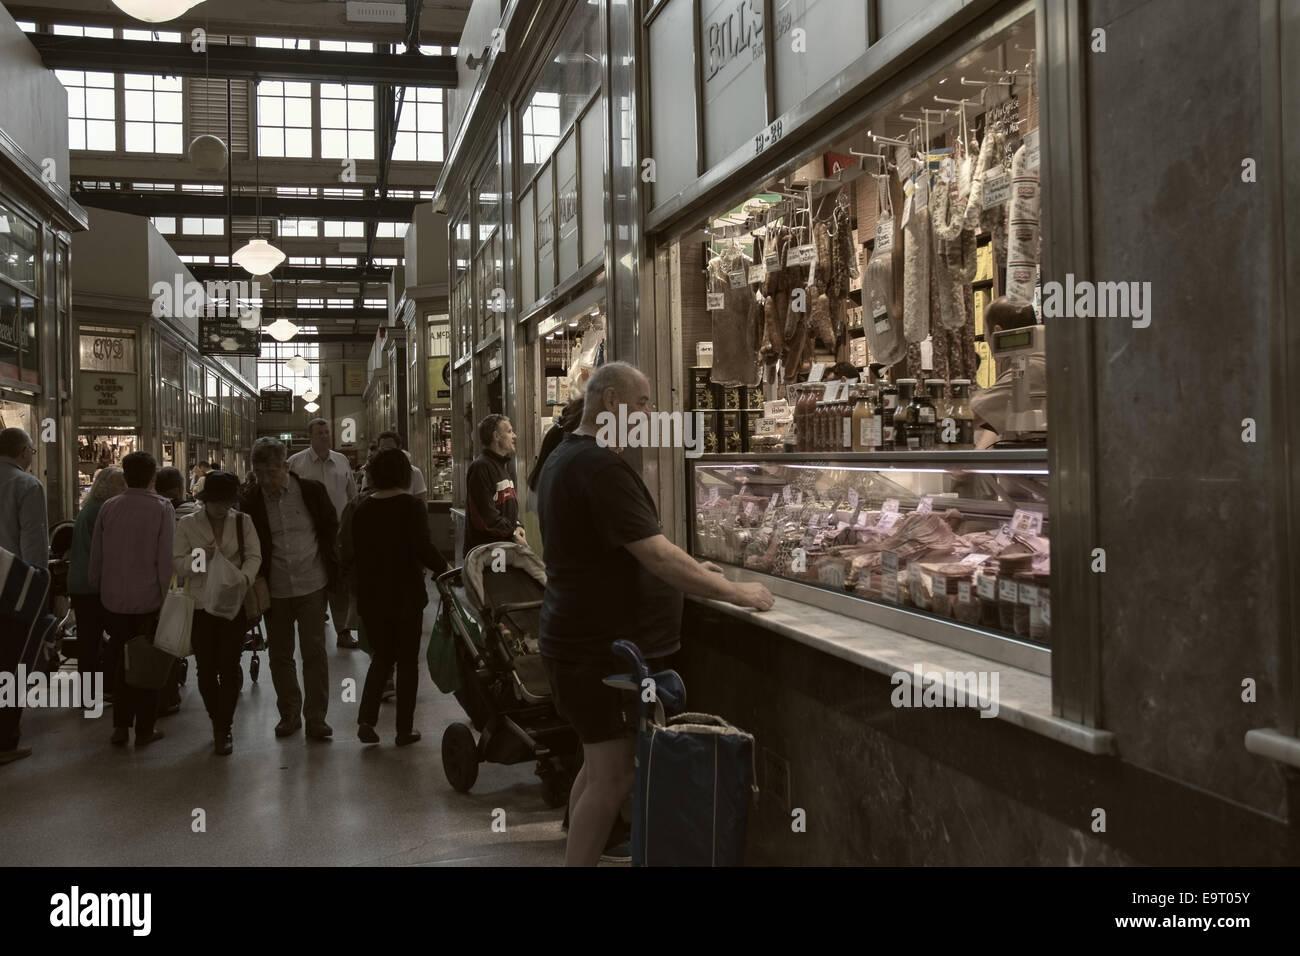 Deli Counter Stock Photos & Deli Counter Stock Images - Alamy